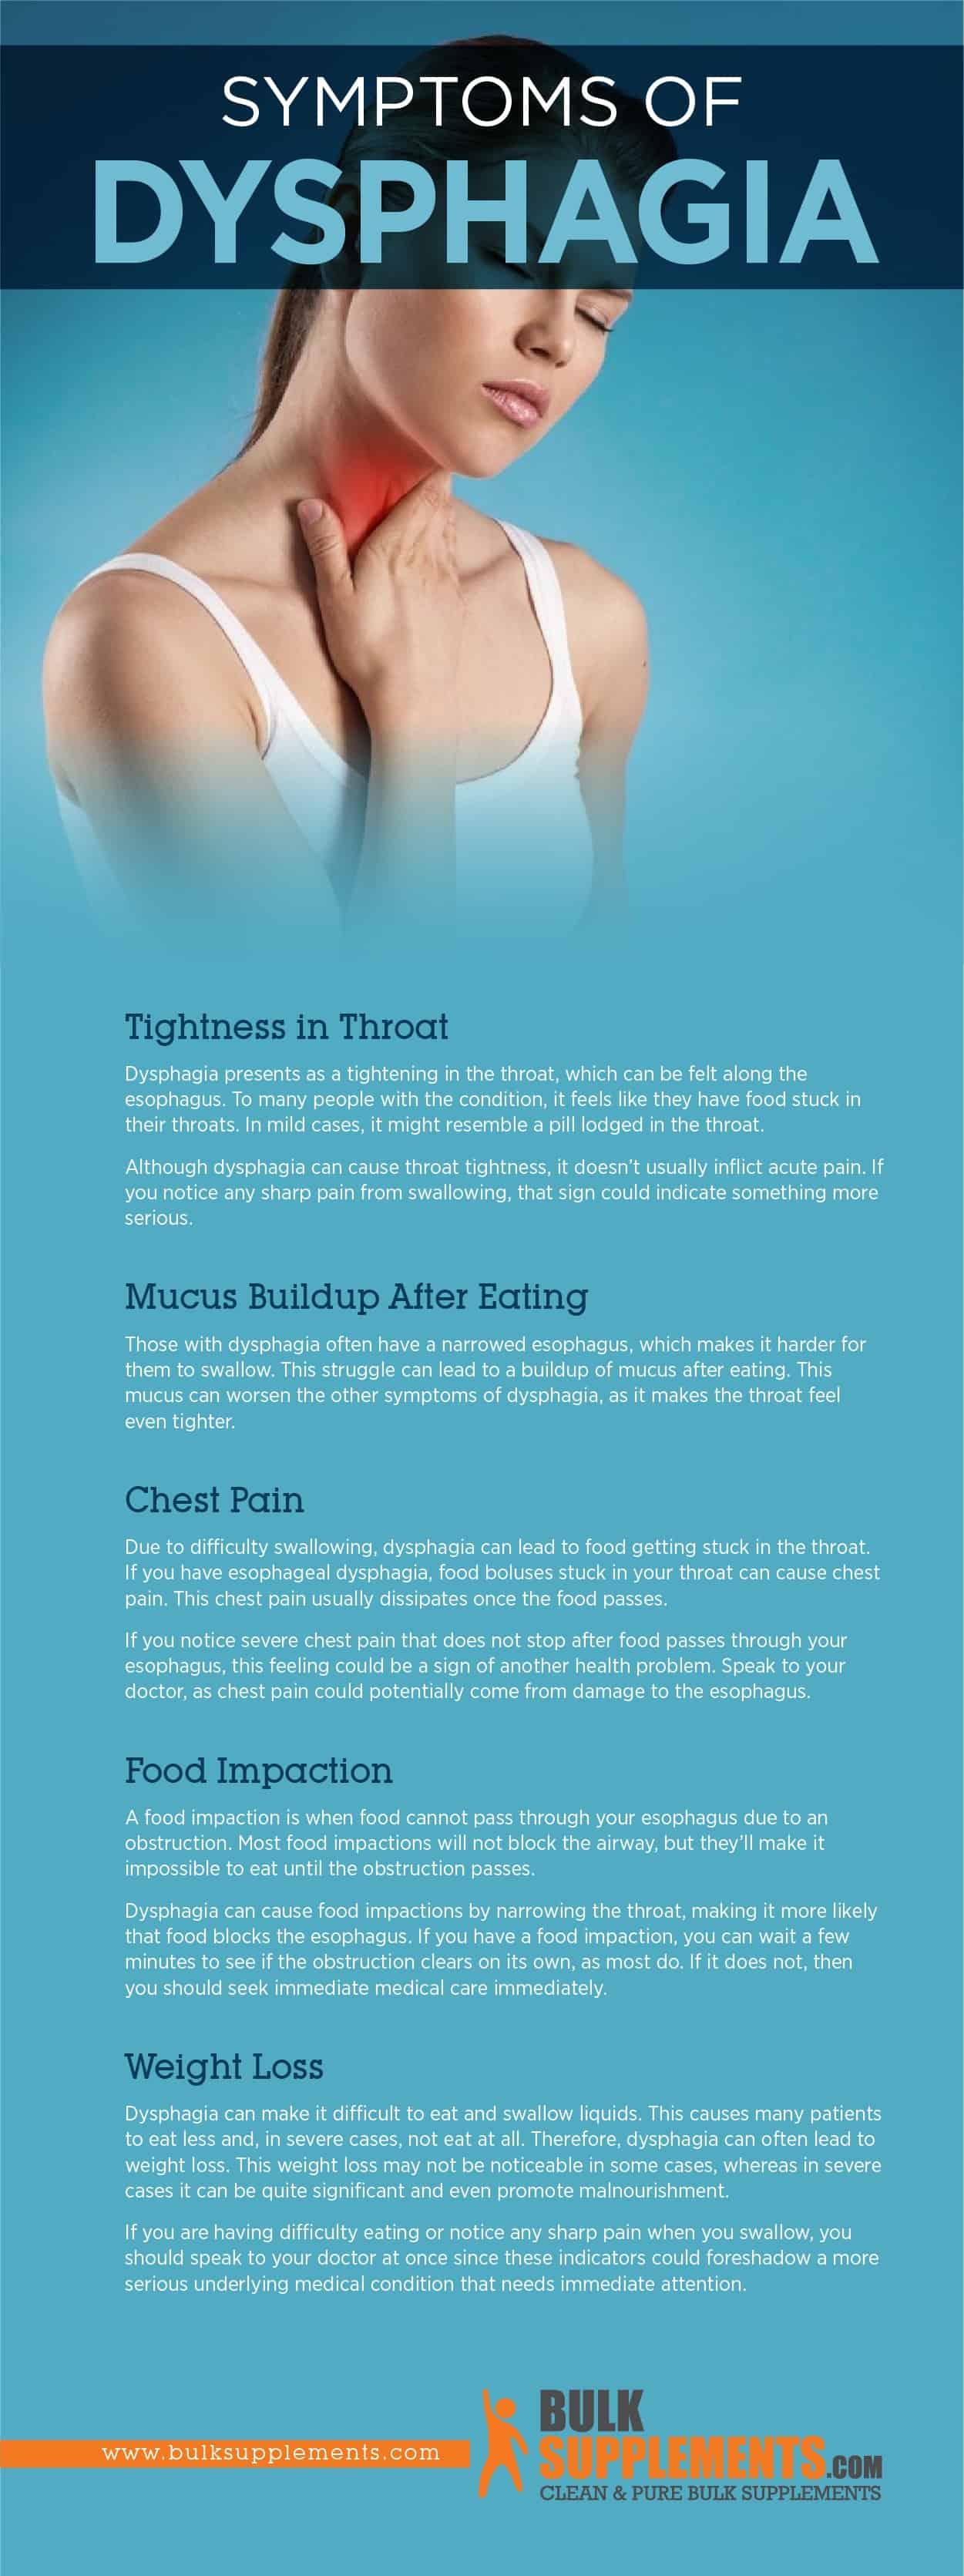 Symptoms of Dysphagia